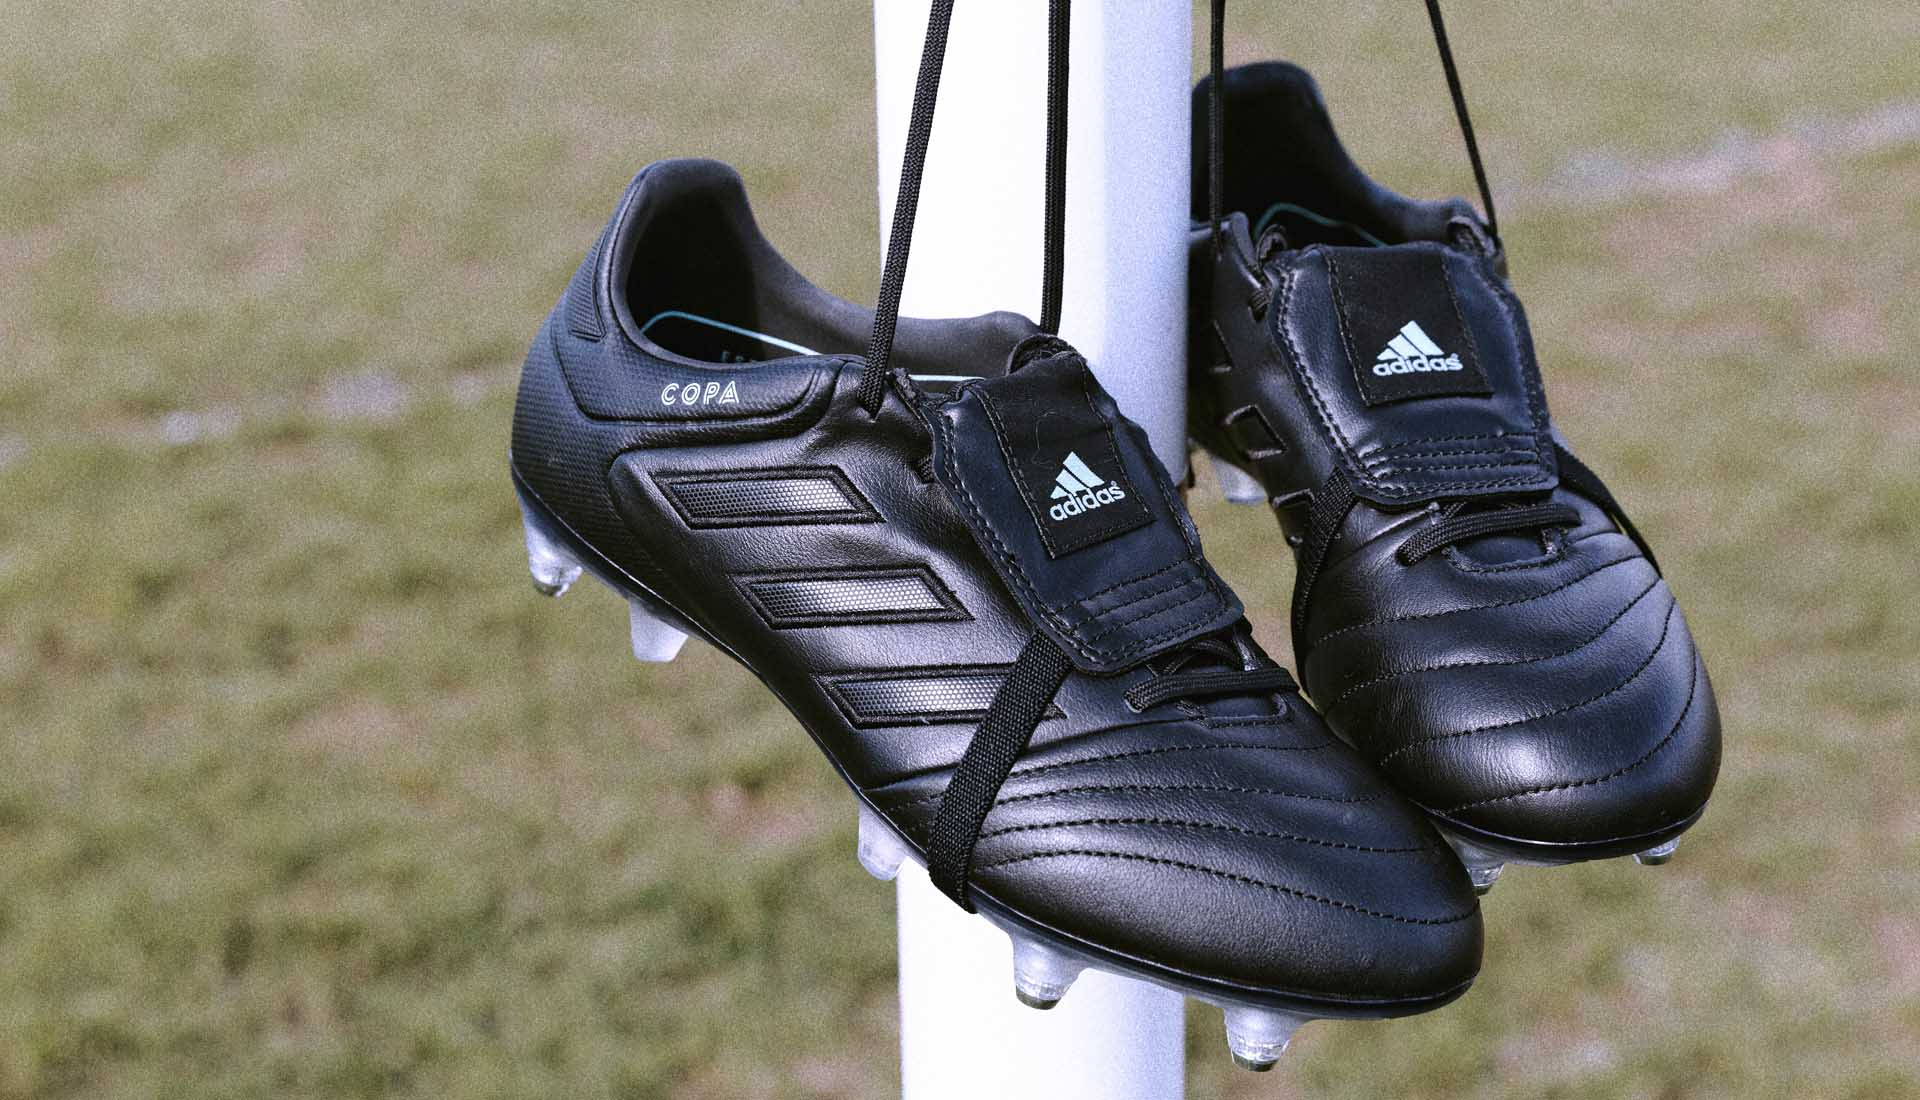 competitive price 54a40 03a00 2-adidas-copa-gloro-sg-min.jpg